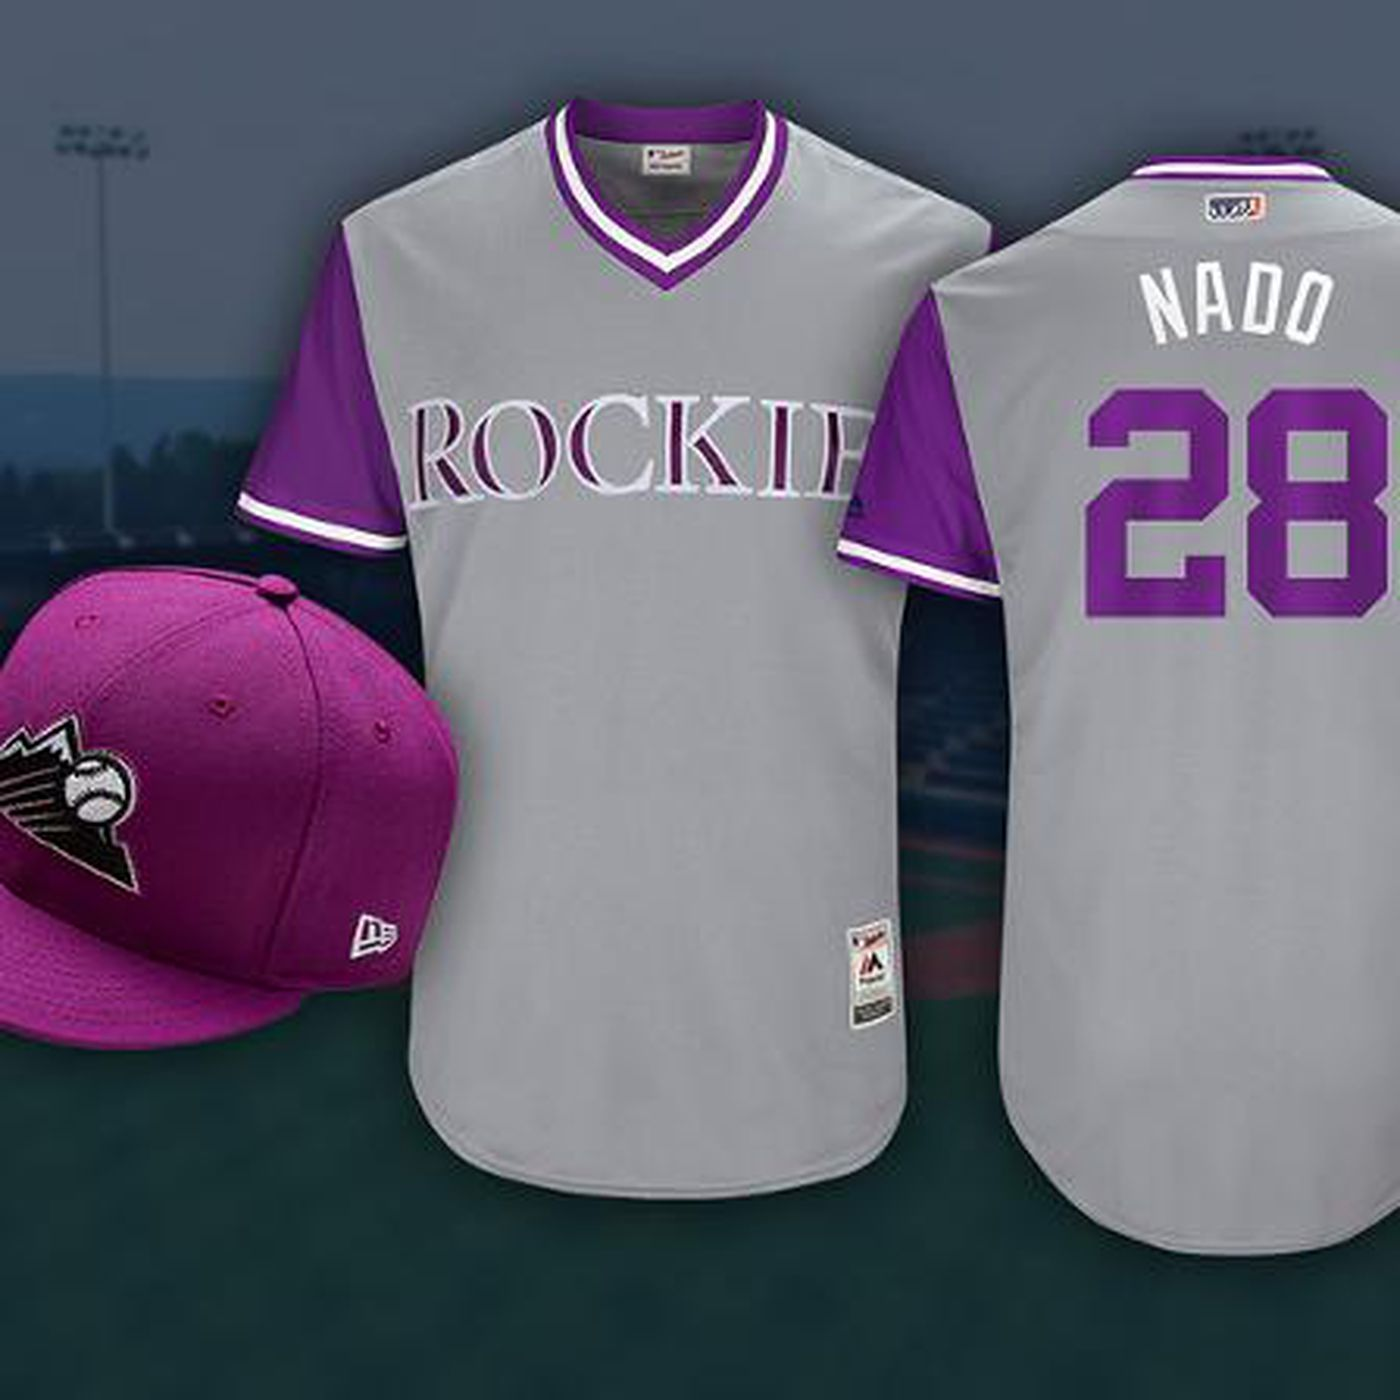 88fed625b Rockies nickname jerseys